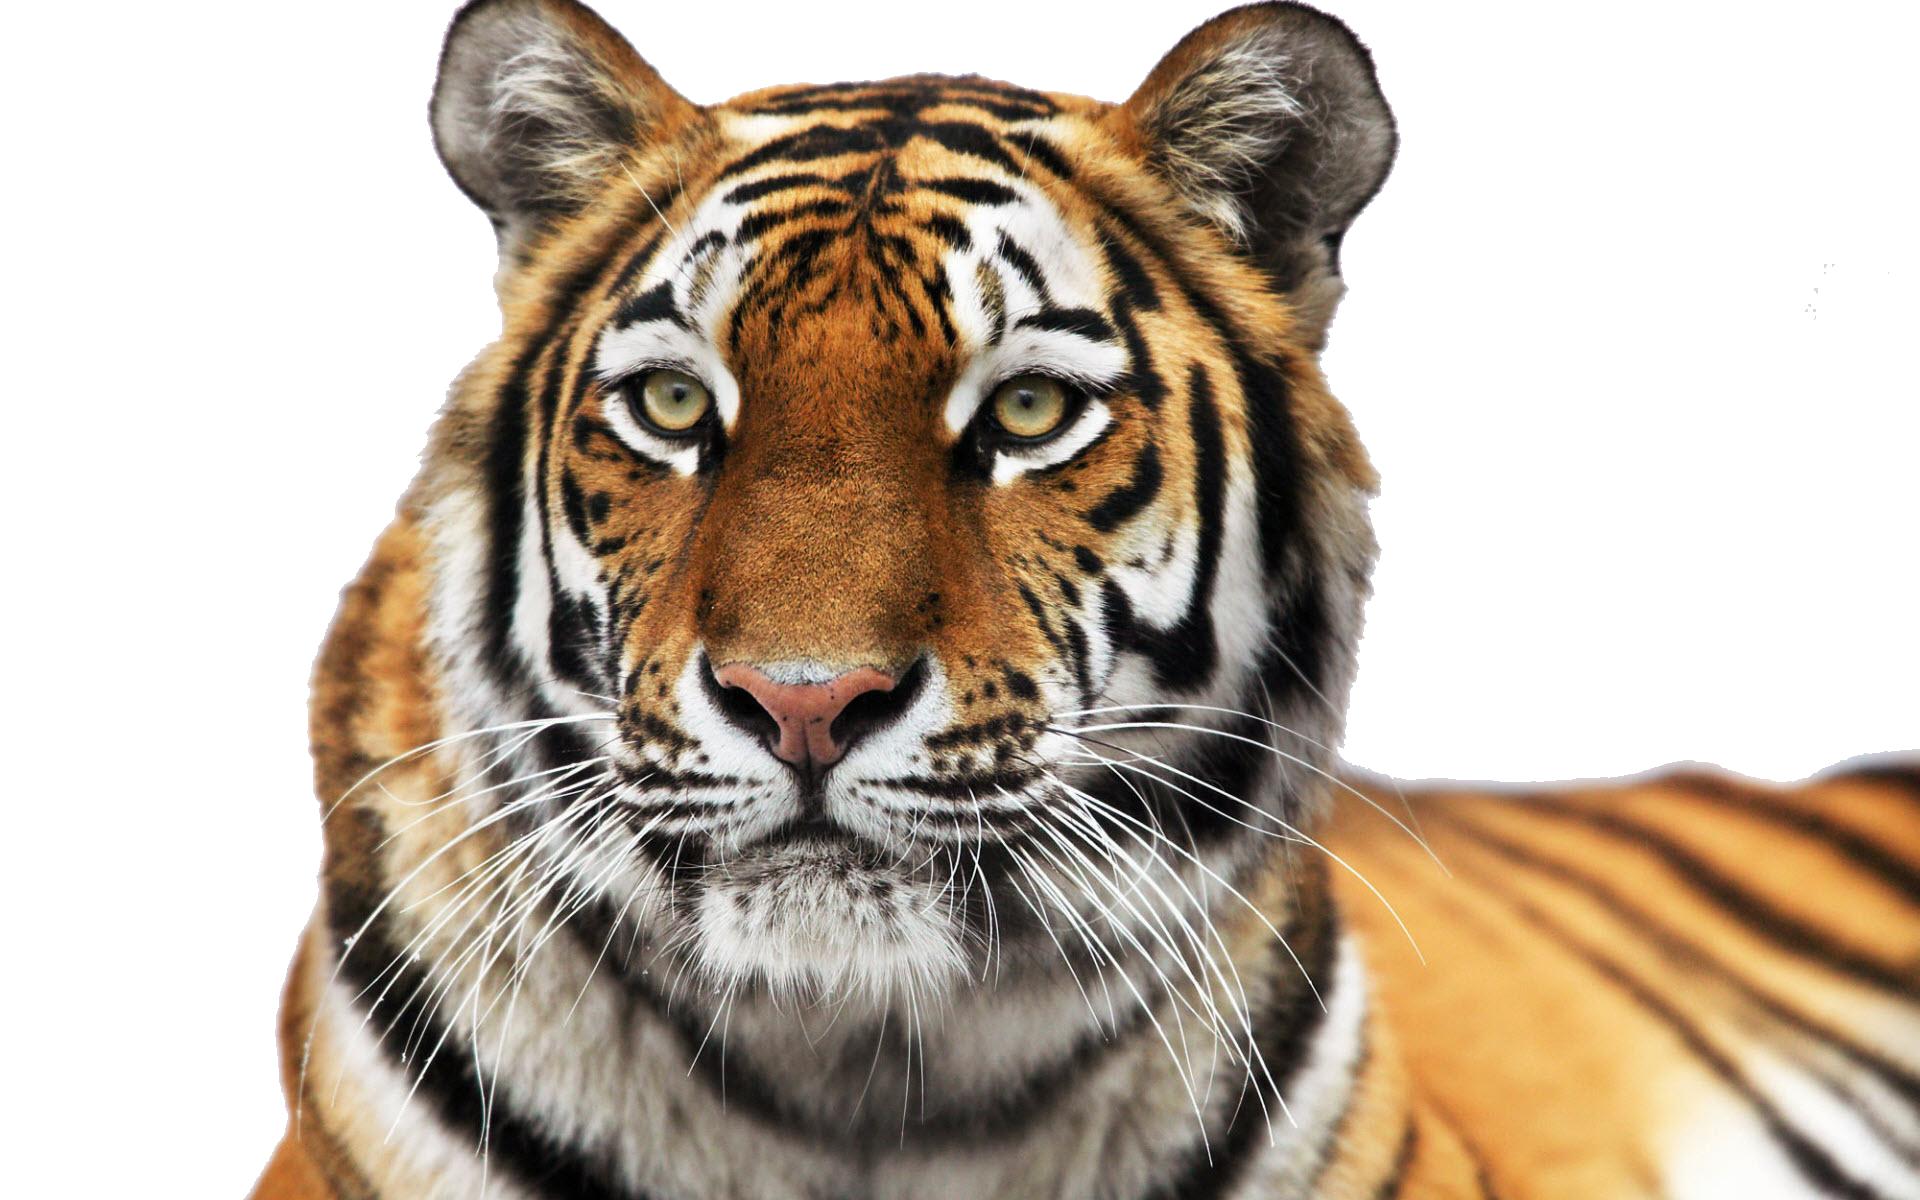 Tiger Face PNG Clipart - Tiger PNG